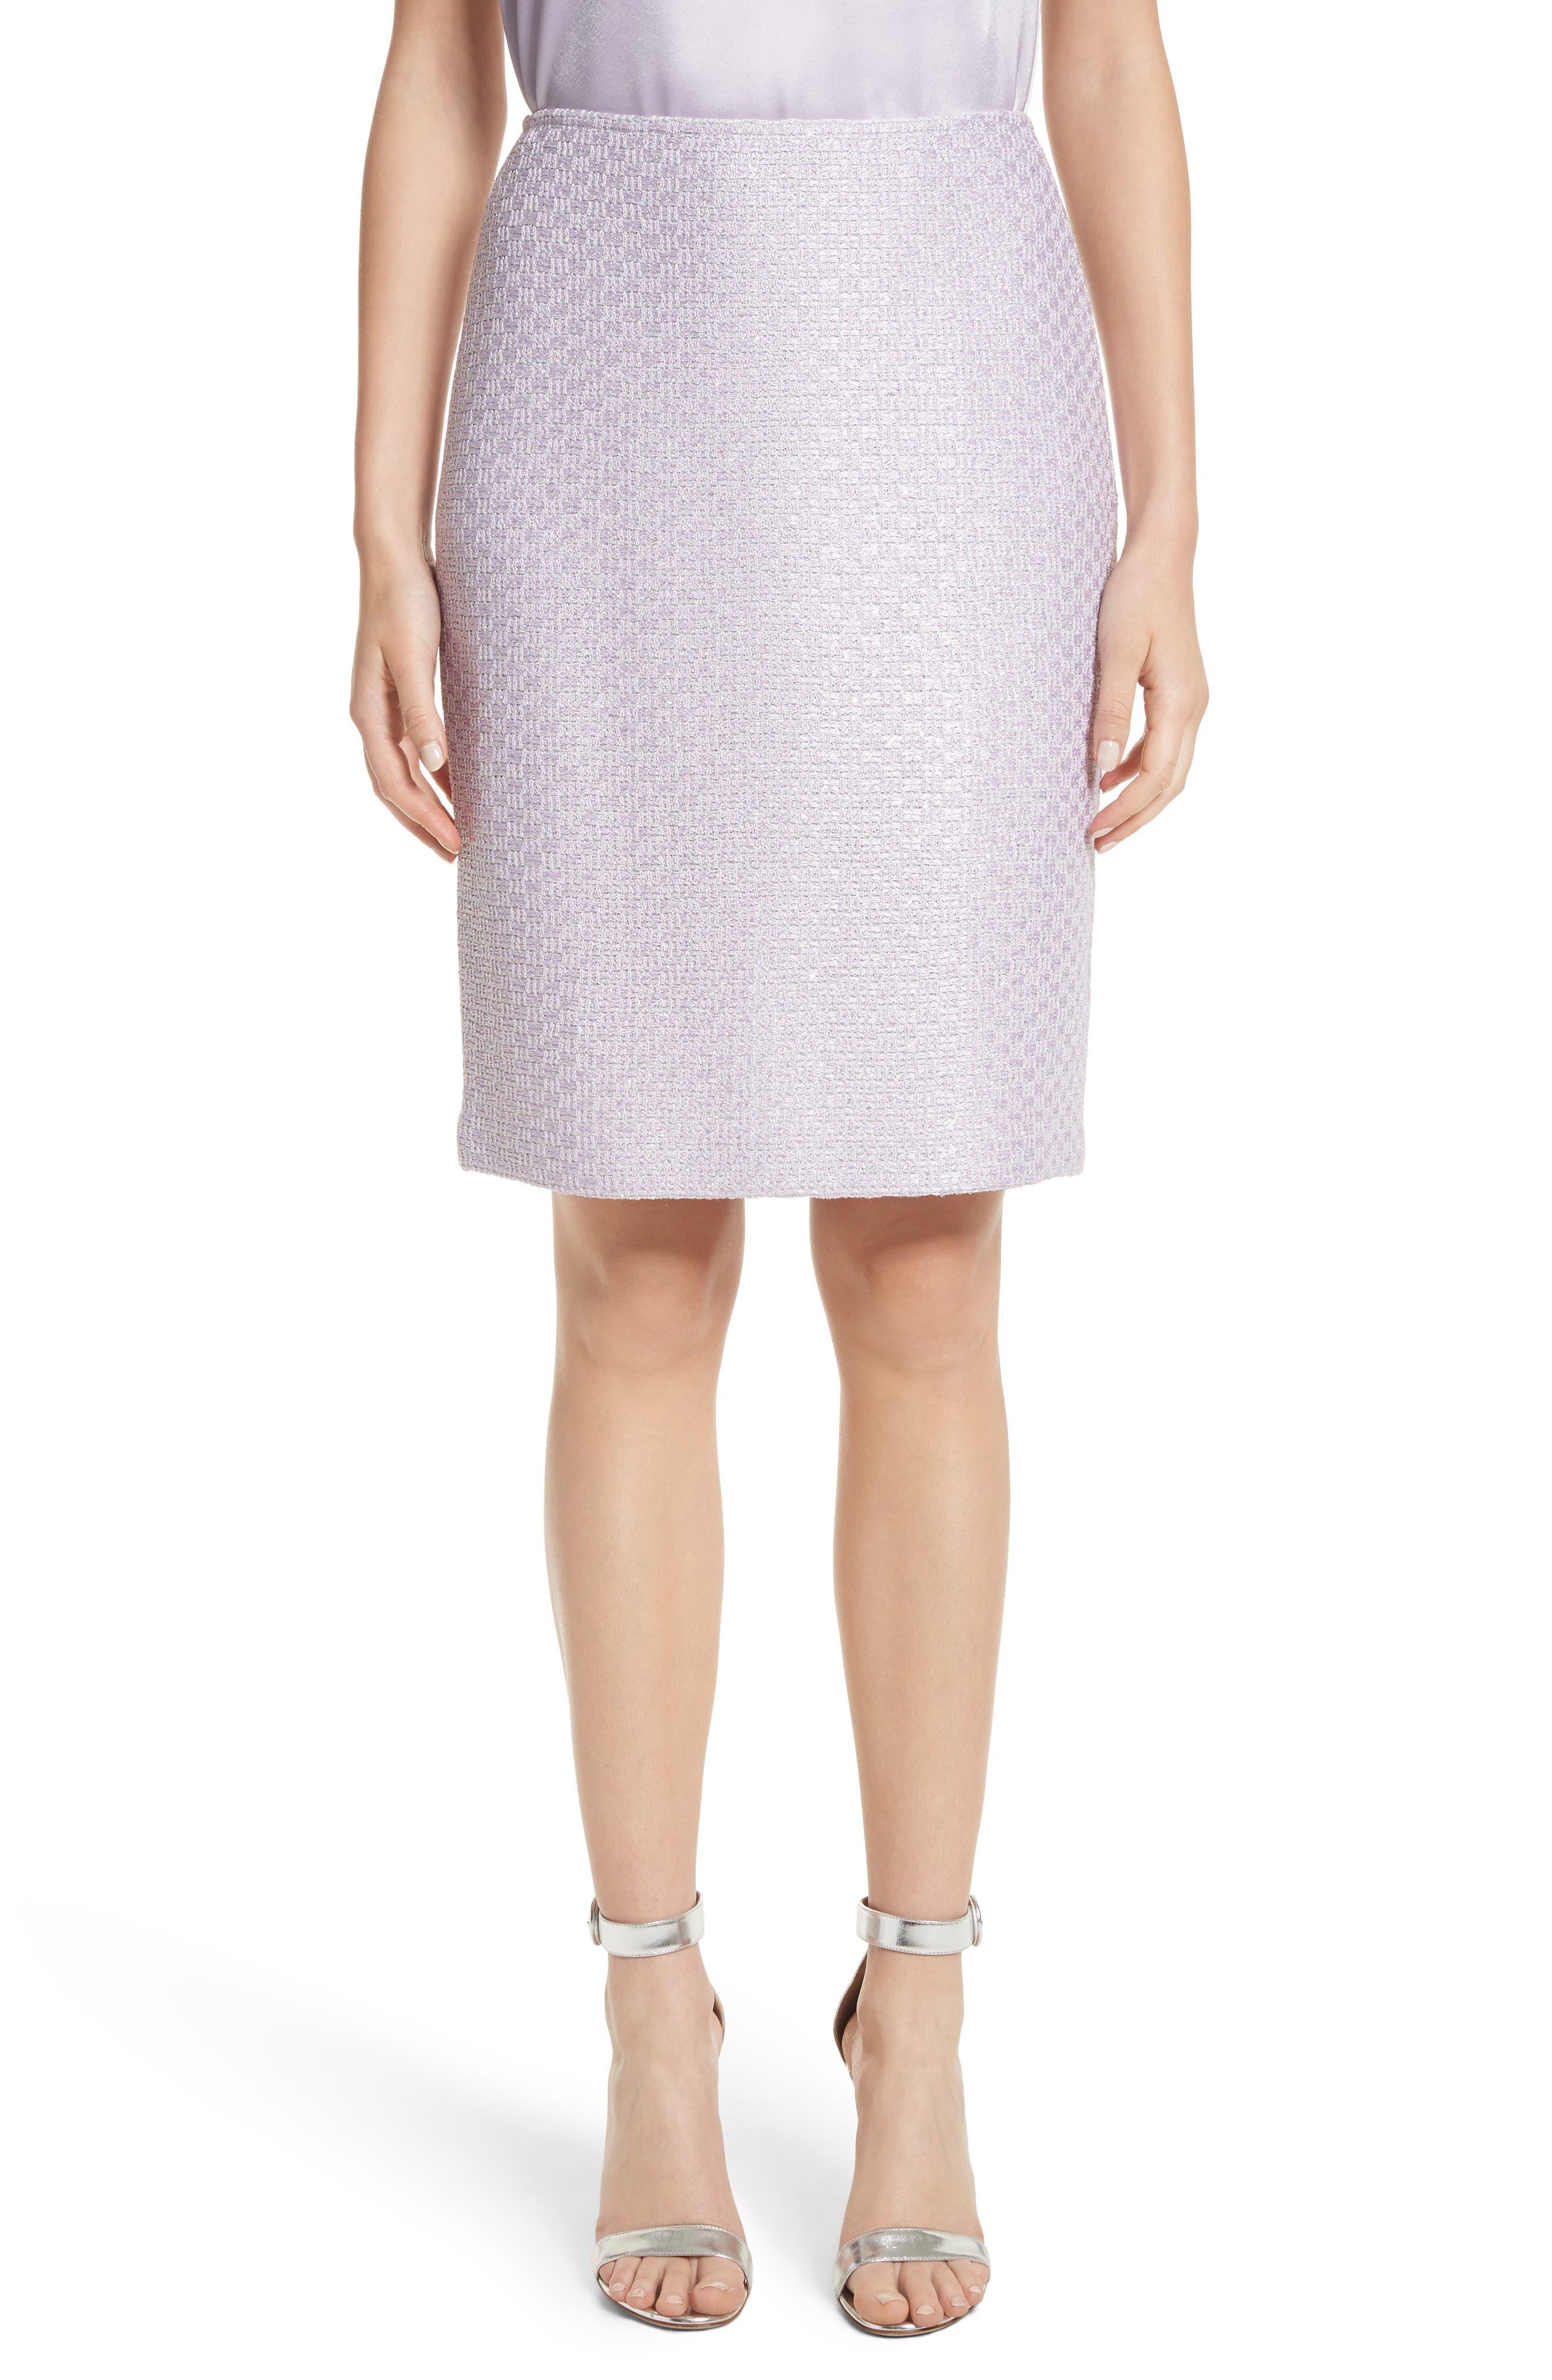 Hansh Sequin Knit Pencil Skirt,                             Main thumbnail 1, color,